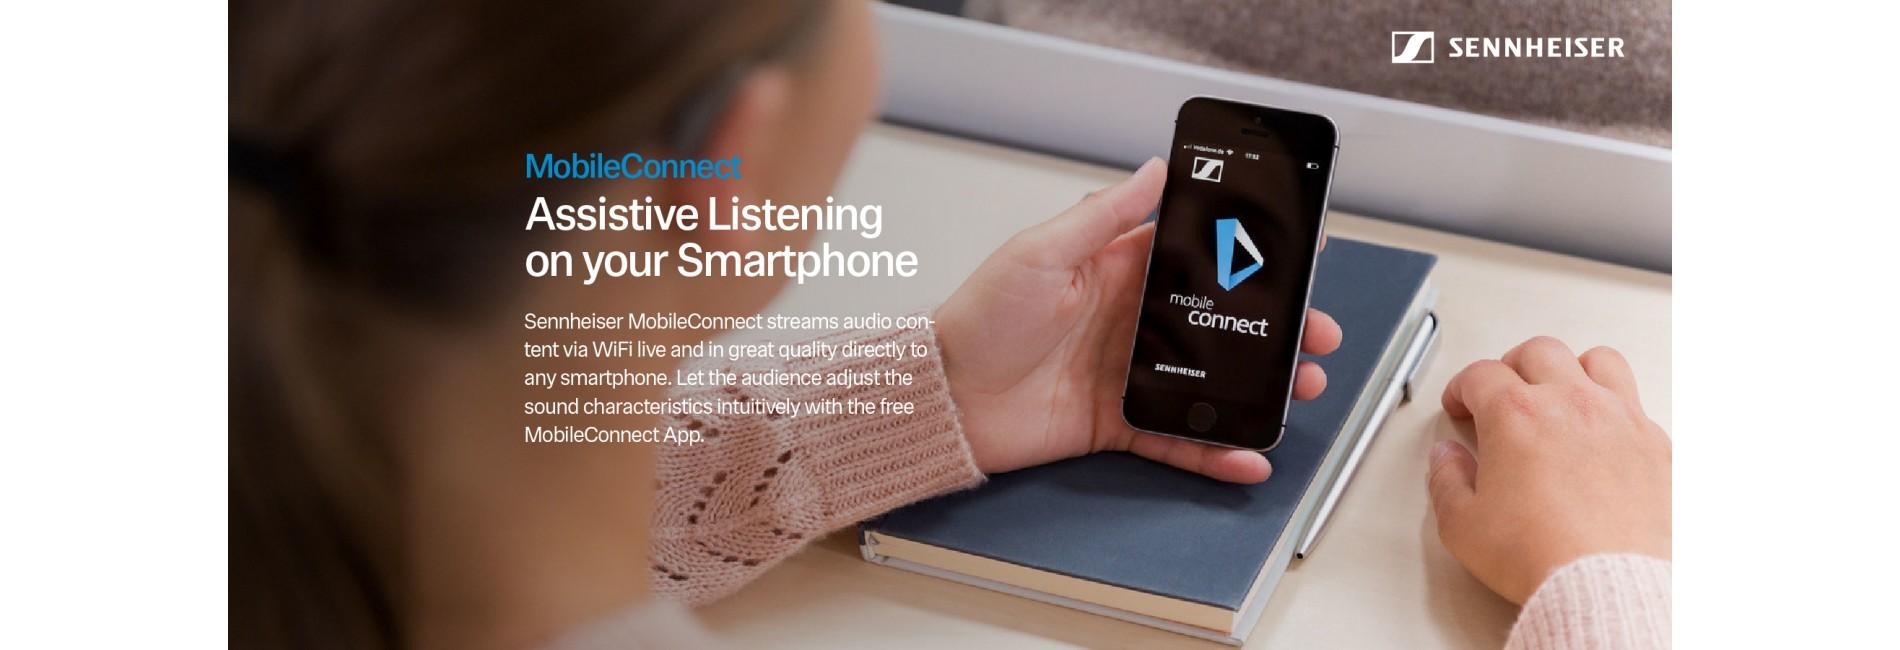 Sennheiser MobileConnect